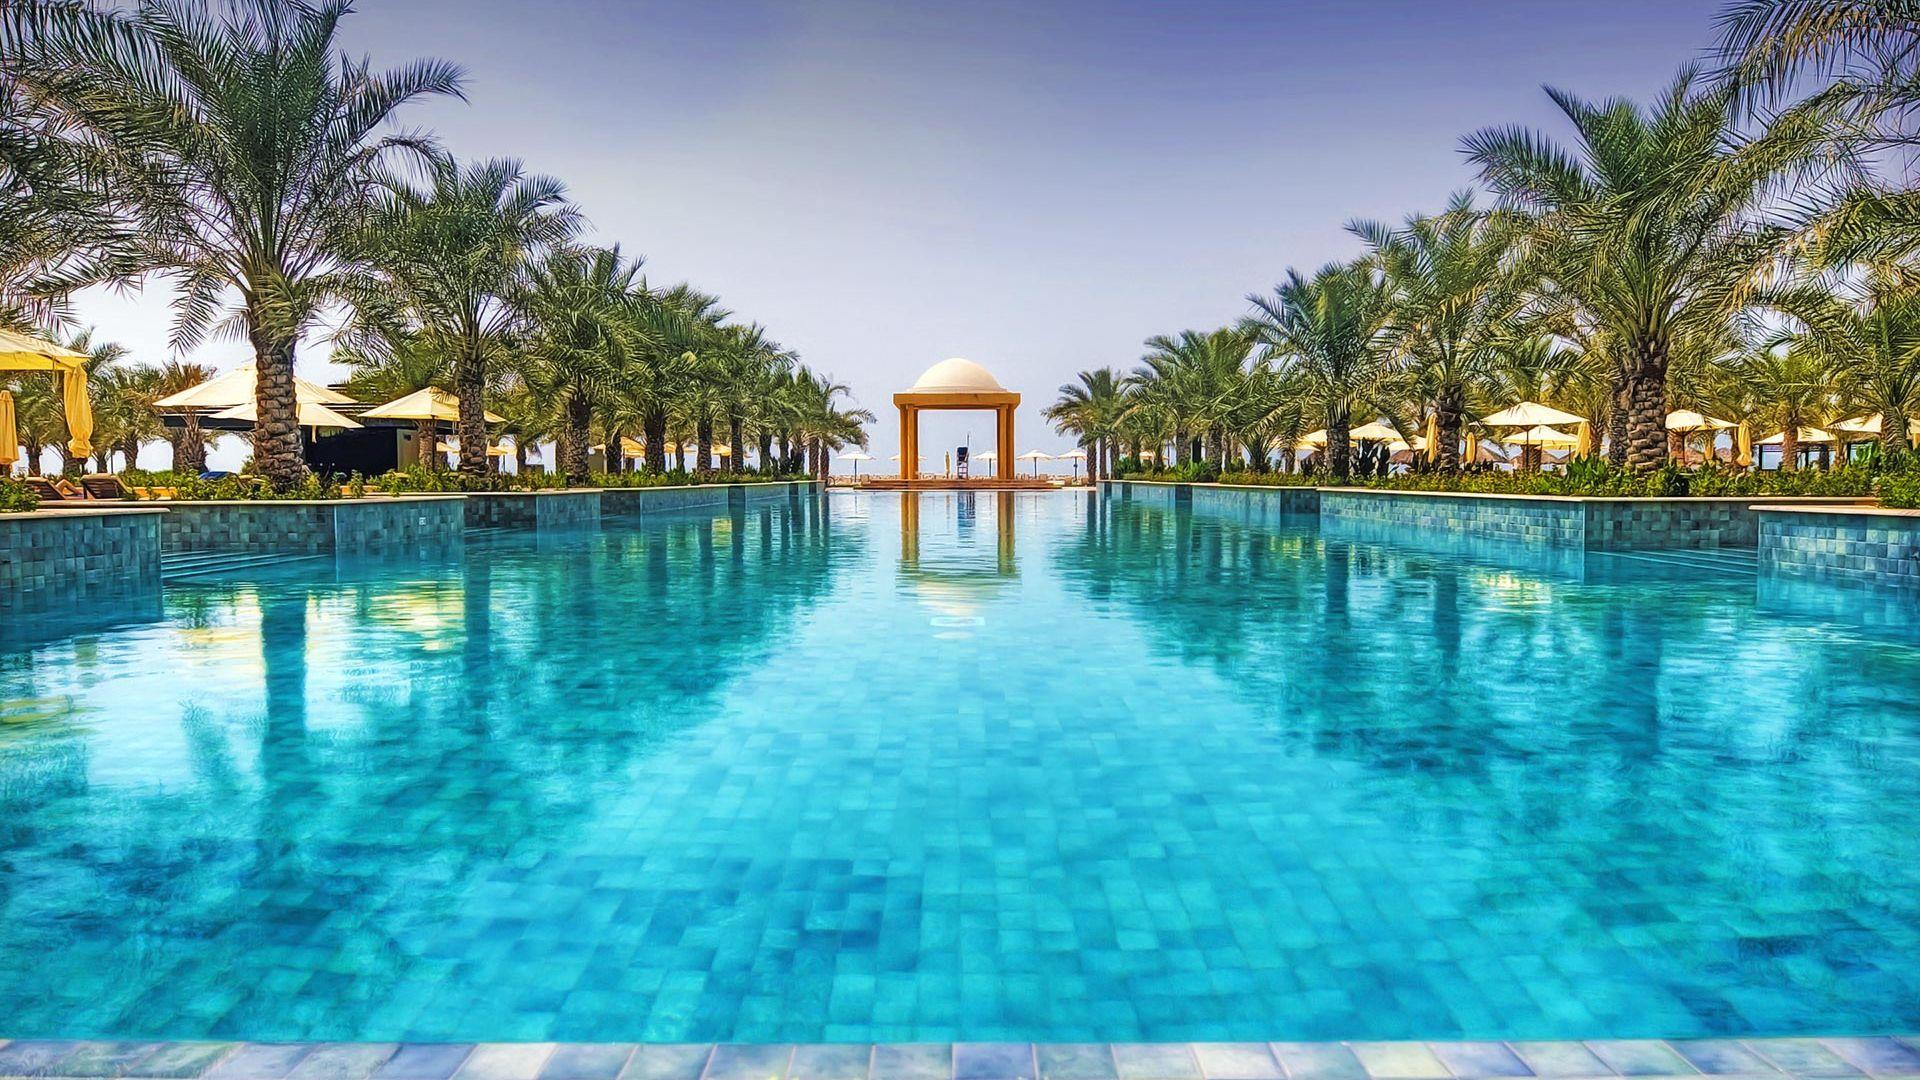 Oferta zilei - Sejur charter Ras Al Khaimah, EAU, 8 zile - 7 noiembrie 2021